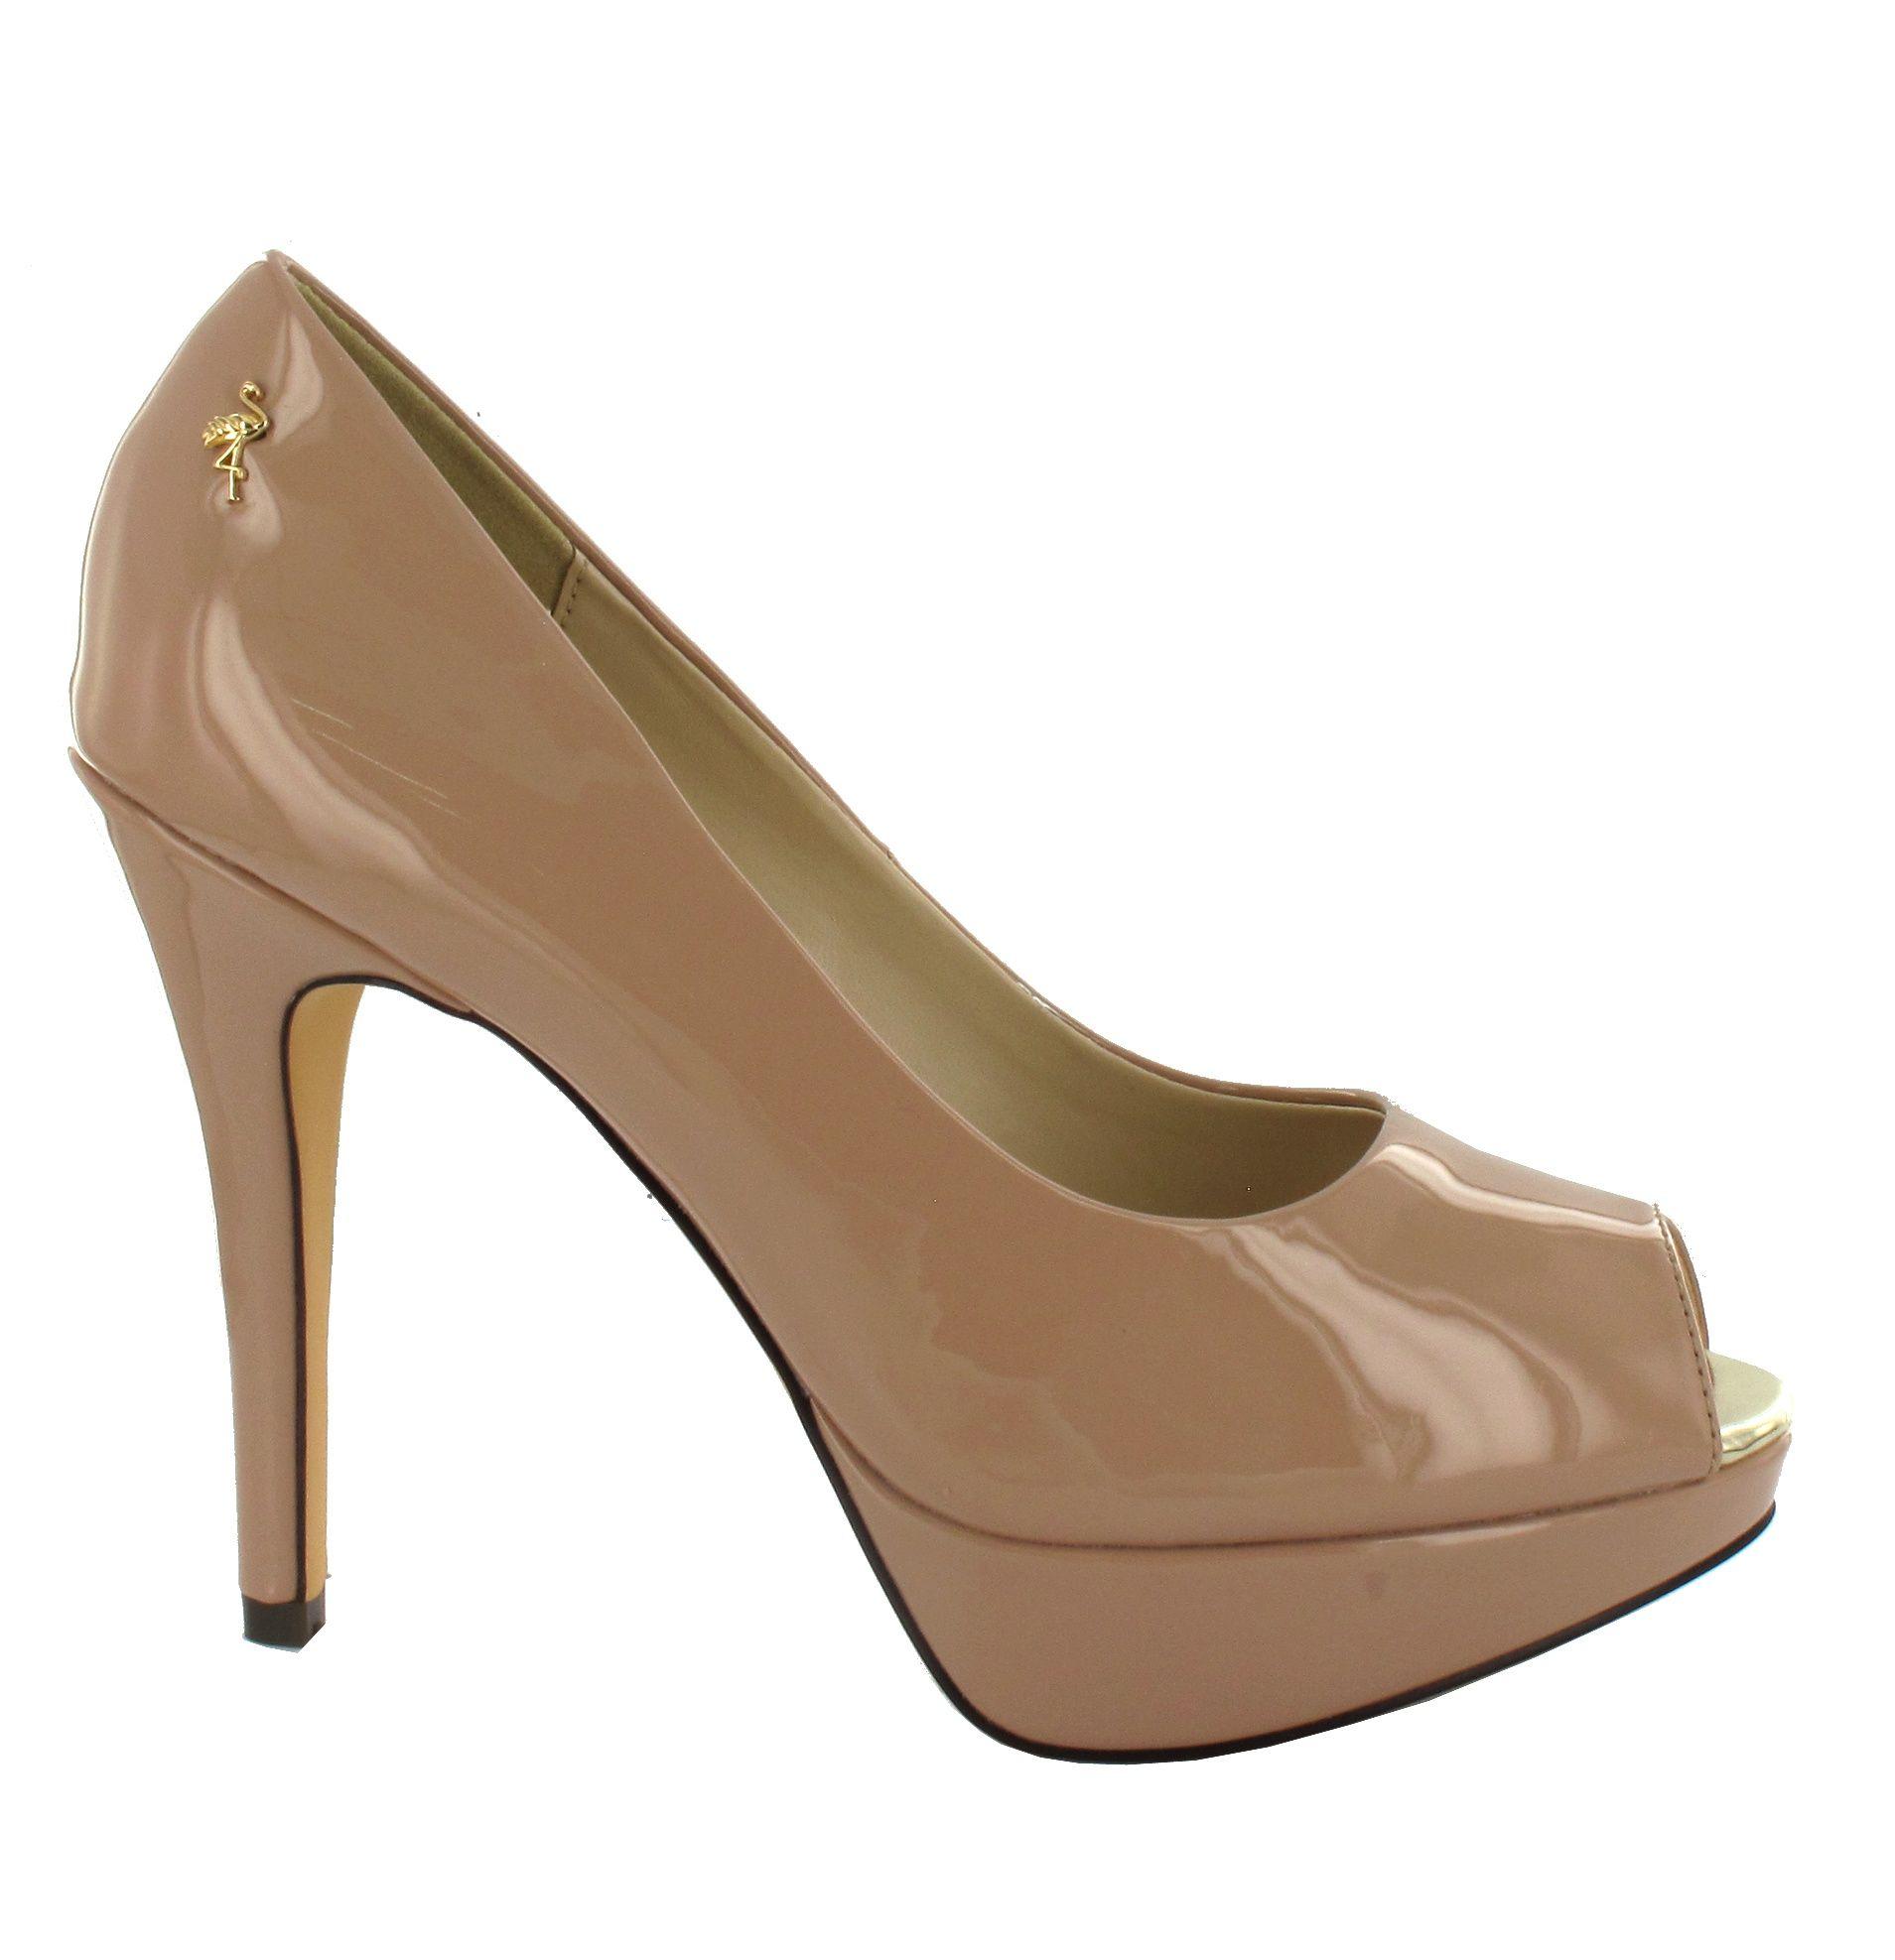 Zapatos peep toe de charol nude zXm61